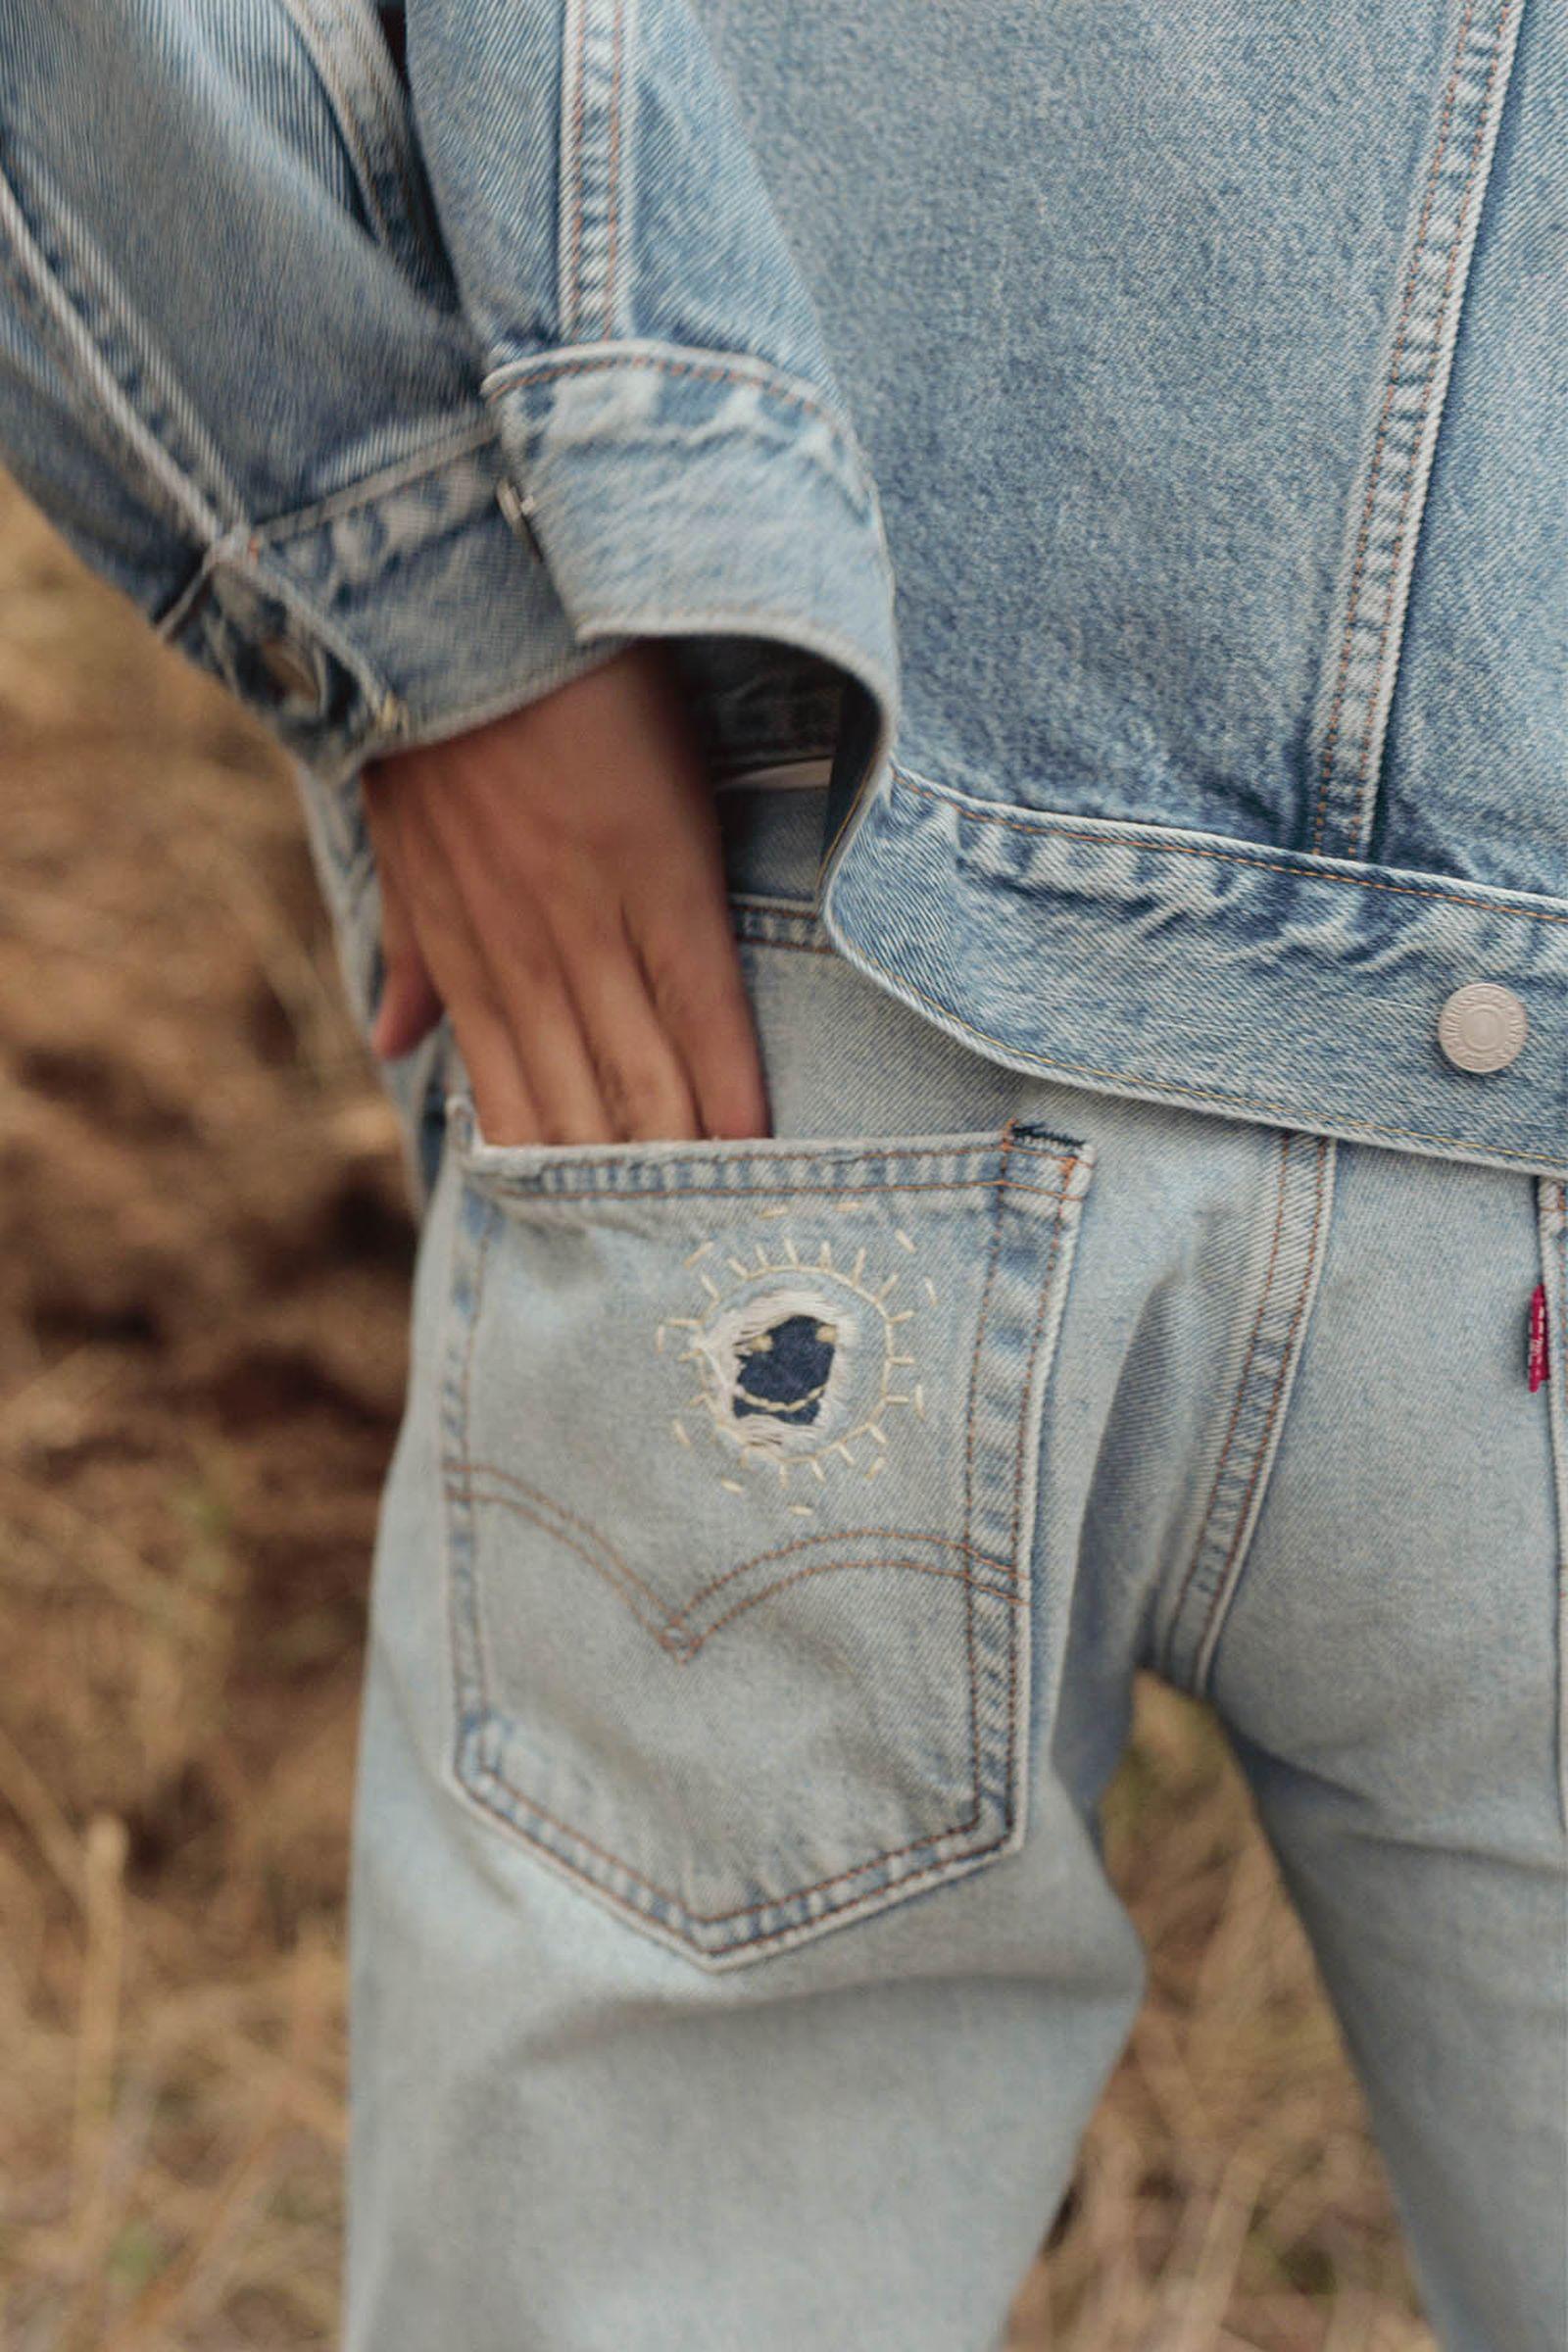 551™ Z Authentic Straight Jeans in Phantom